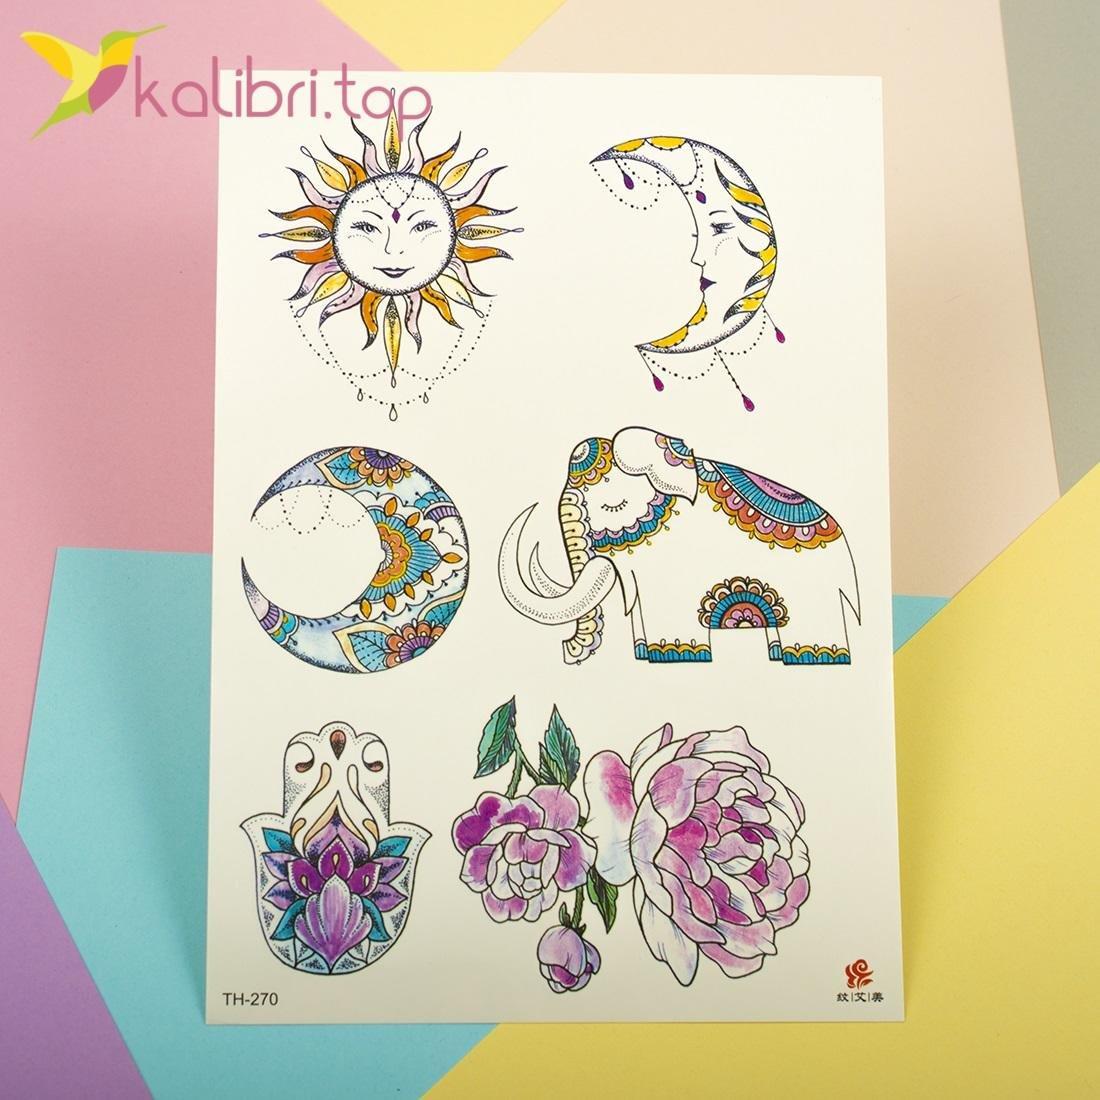 Татуировки - солнце, луна - Kalibri